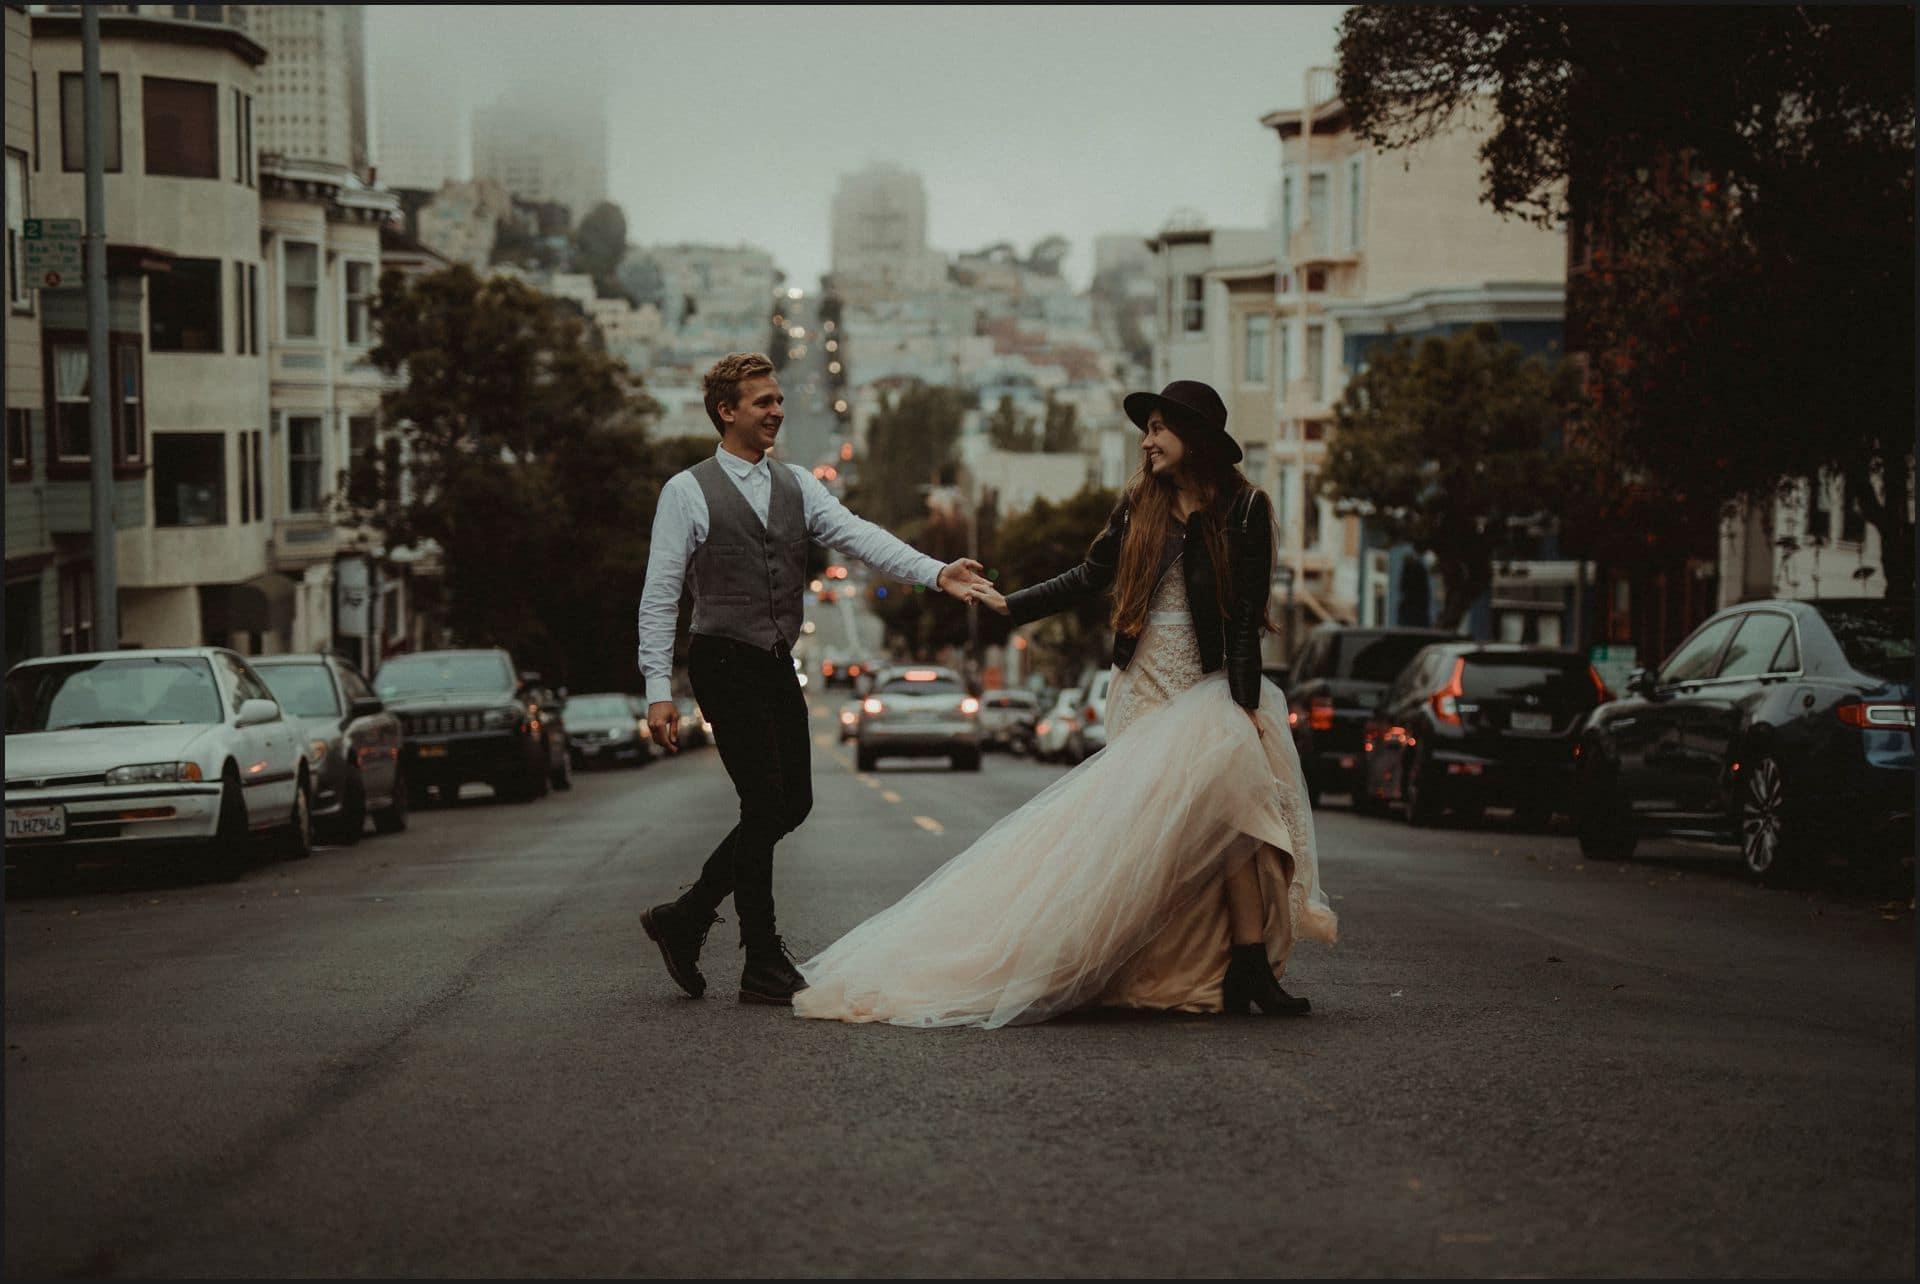 san francisco, california, elopement wedding, road, lombard street, groom, bride